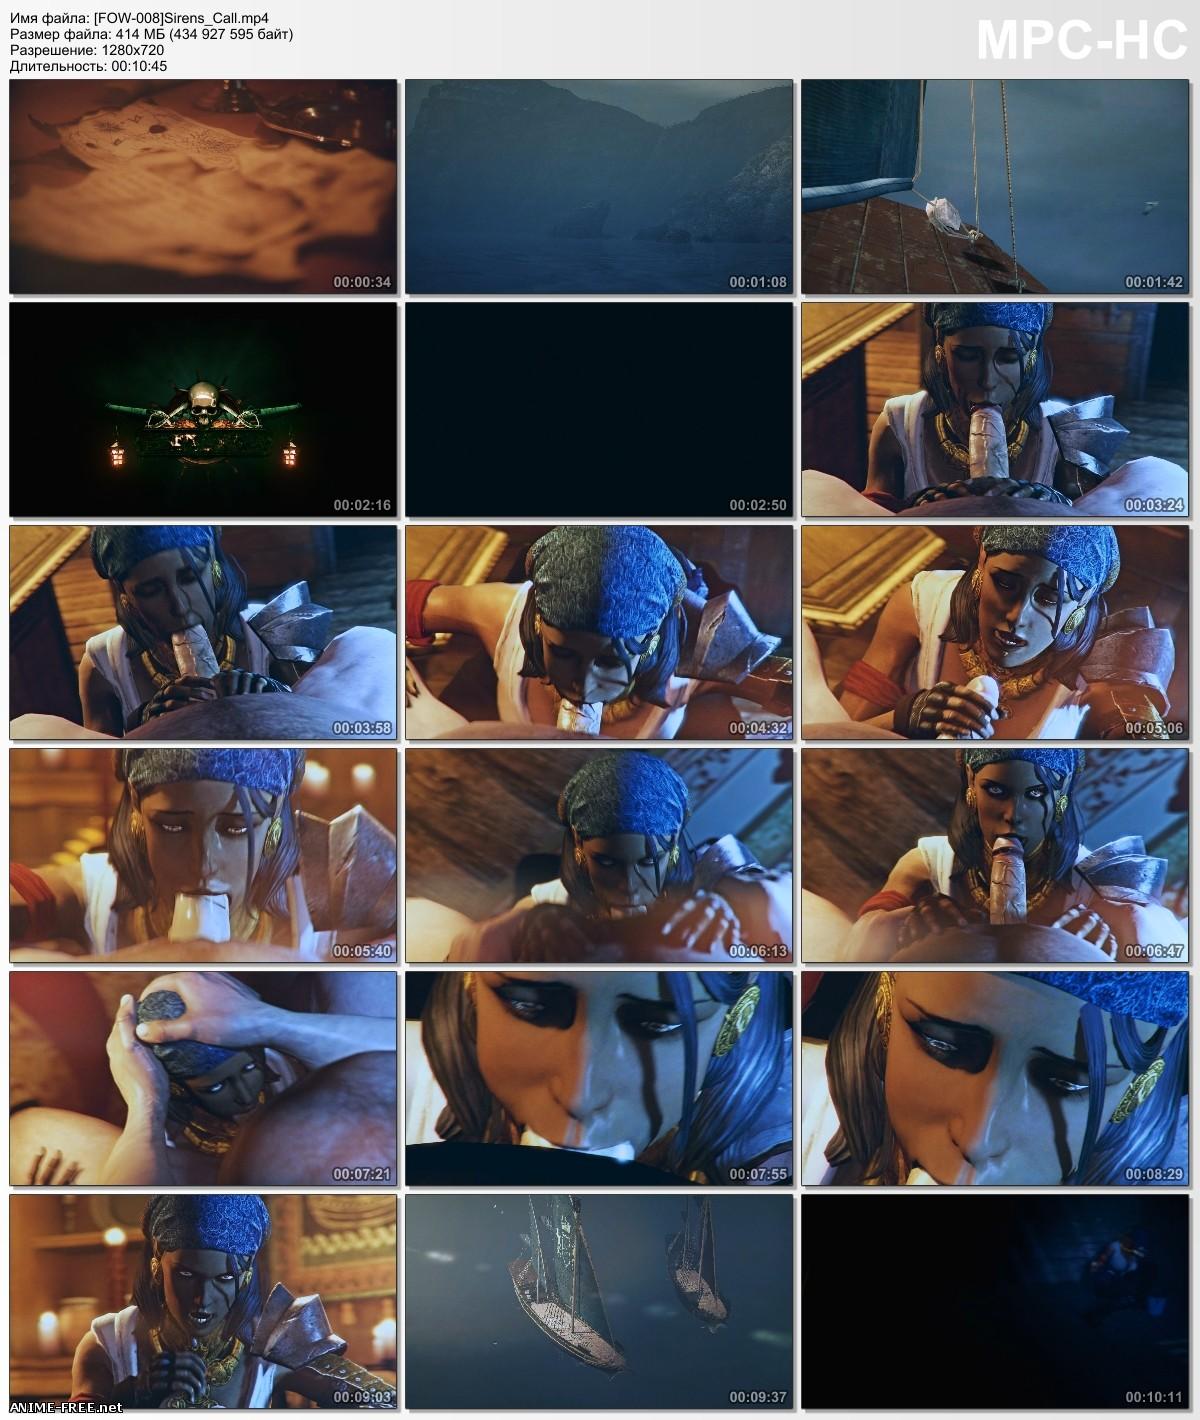 SIREN'S CALL / PIRATES OF RIALTO (Studio F.O.W.) [2016] [Uncen] [HD/720p] [ENG] 3D-Hentai